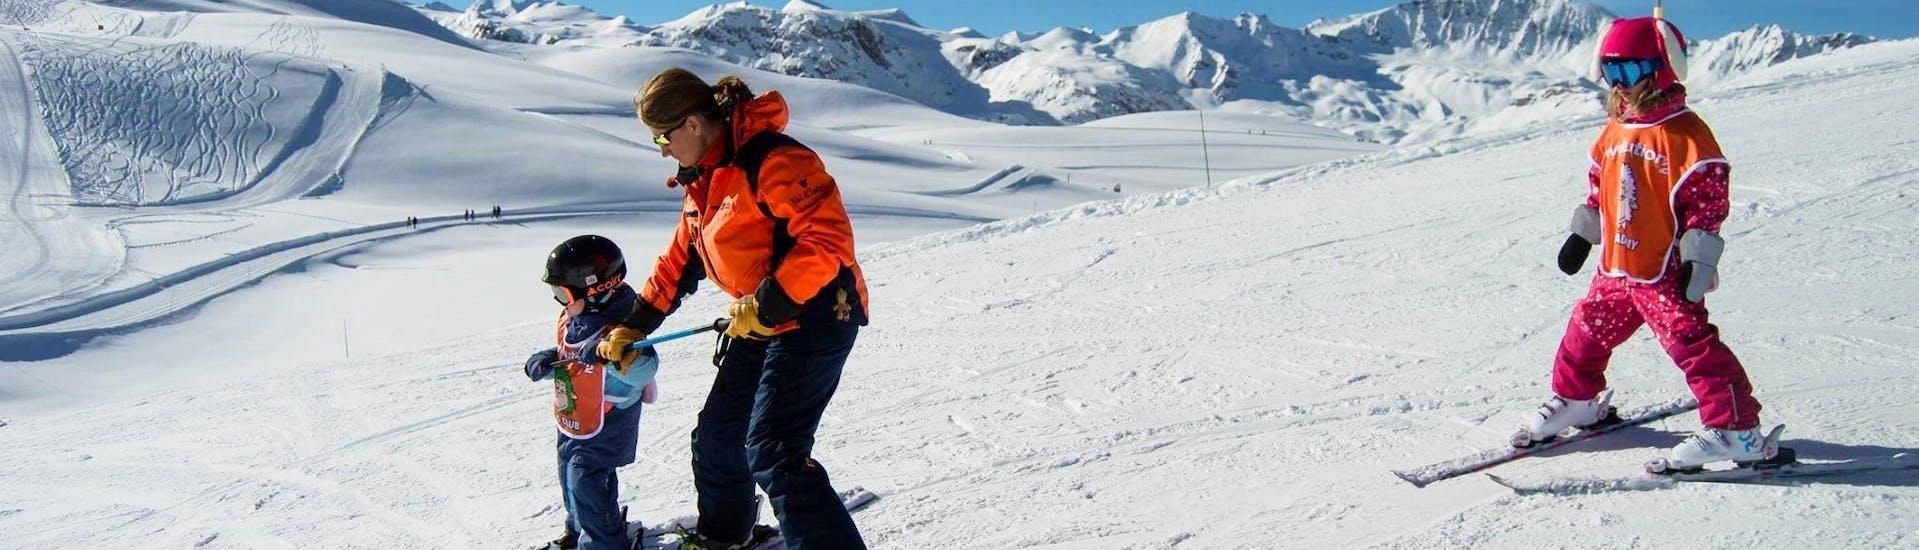 kids-ski-lessons-3-5-years-morning-low-season-evo2-val-d-isere-hero